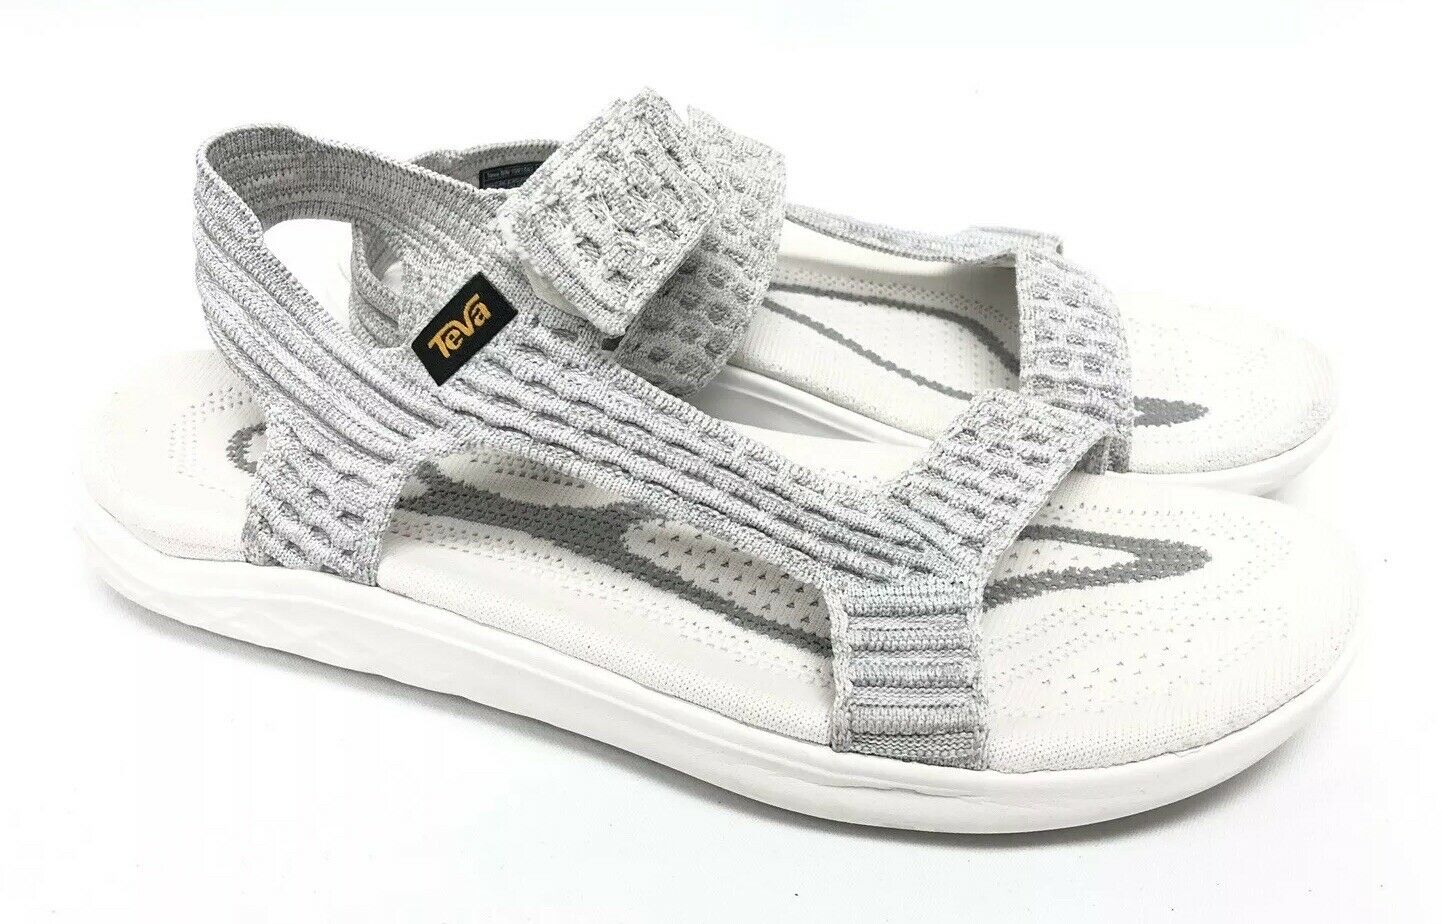 Teva Terra -Float 2 Knit Knit Knit Universal Bright vit Sandal Strappy 1091593 Sport  spara 35% - 70% rabatt